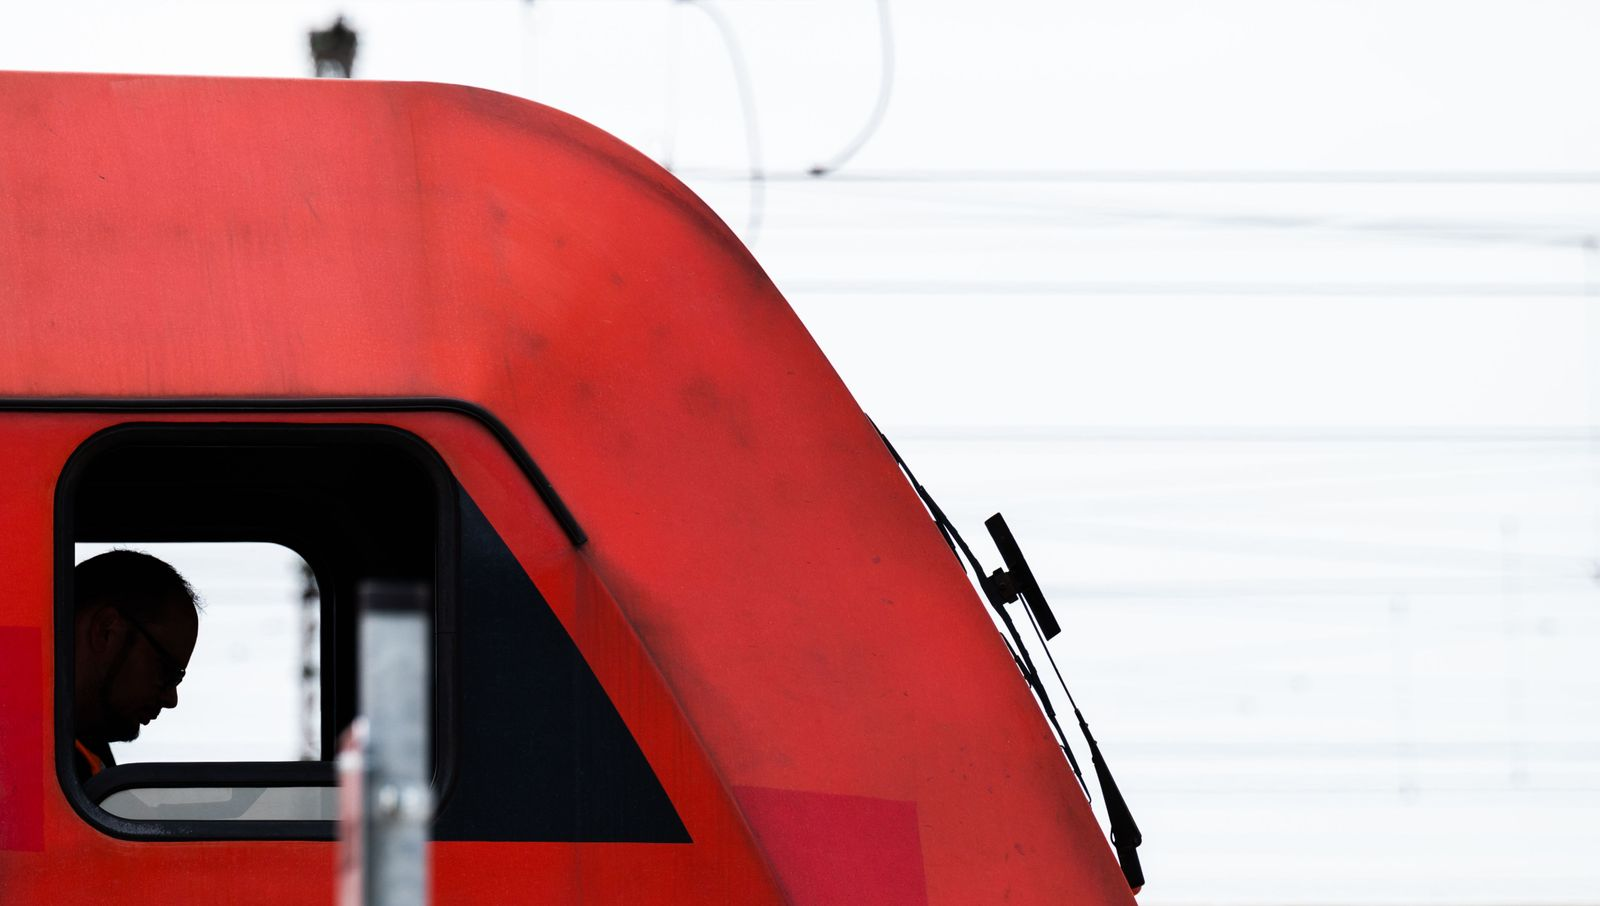 Lokführer beschließen Arbeitskampf bei der Bahn